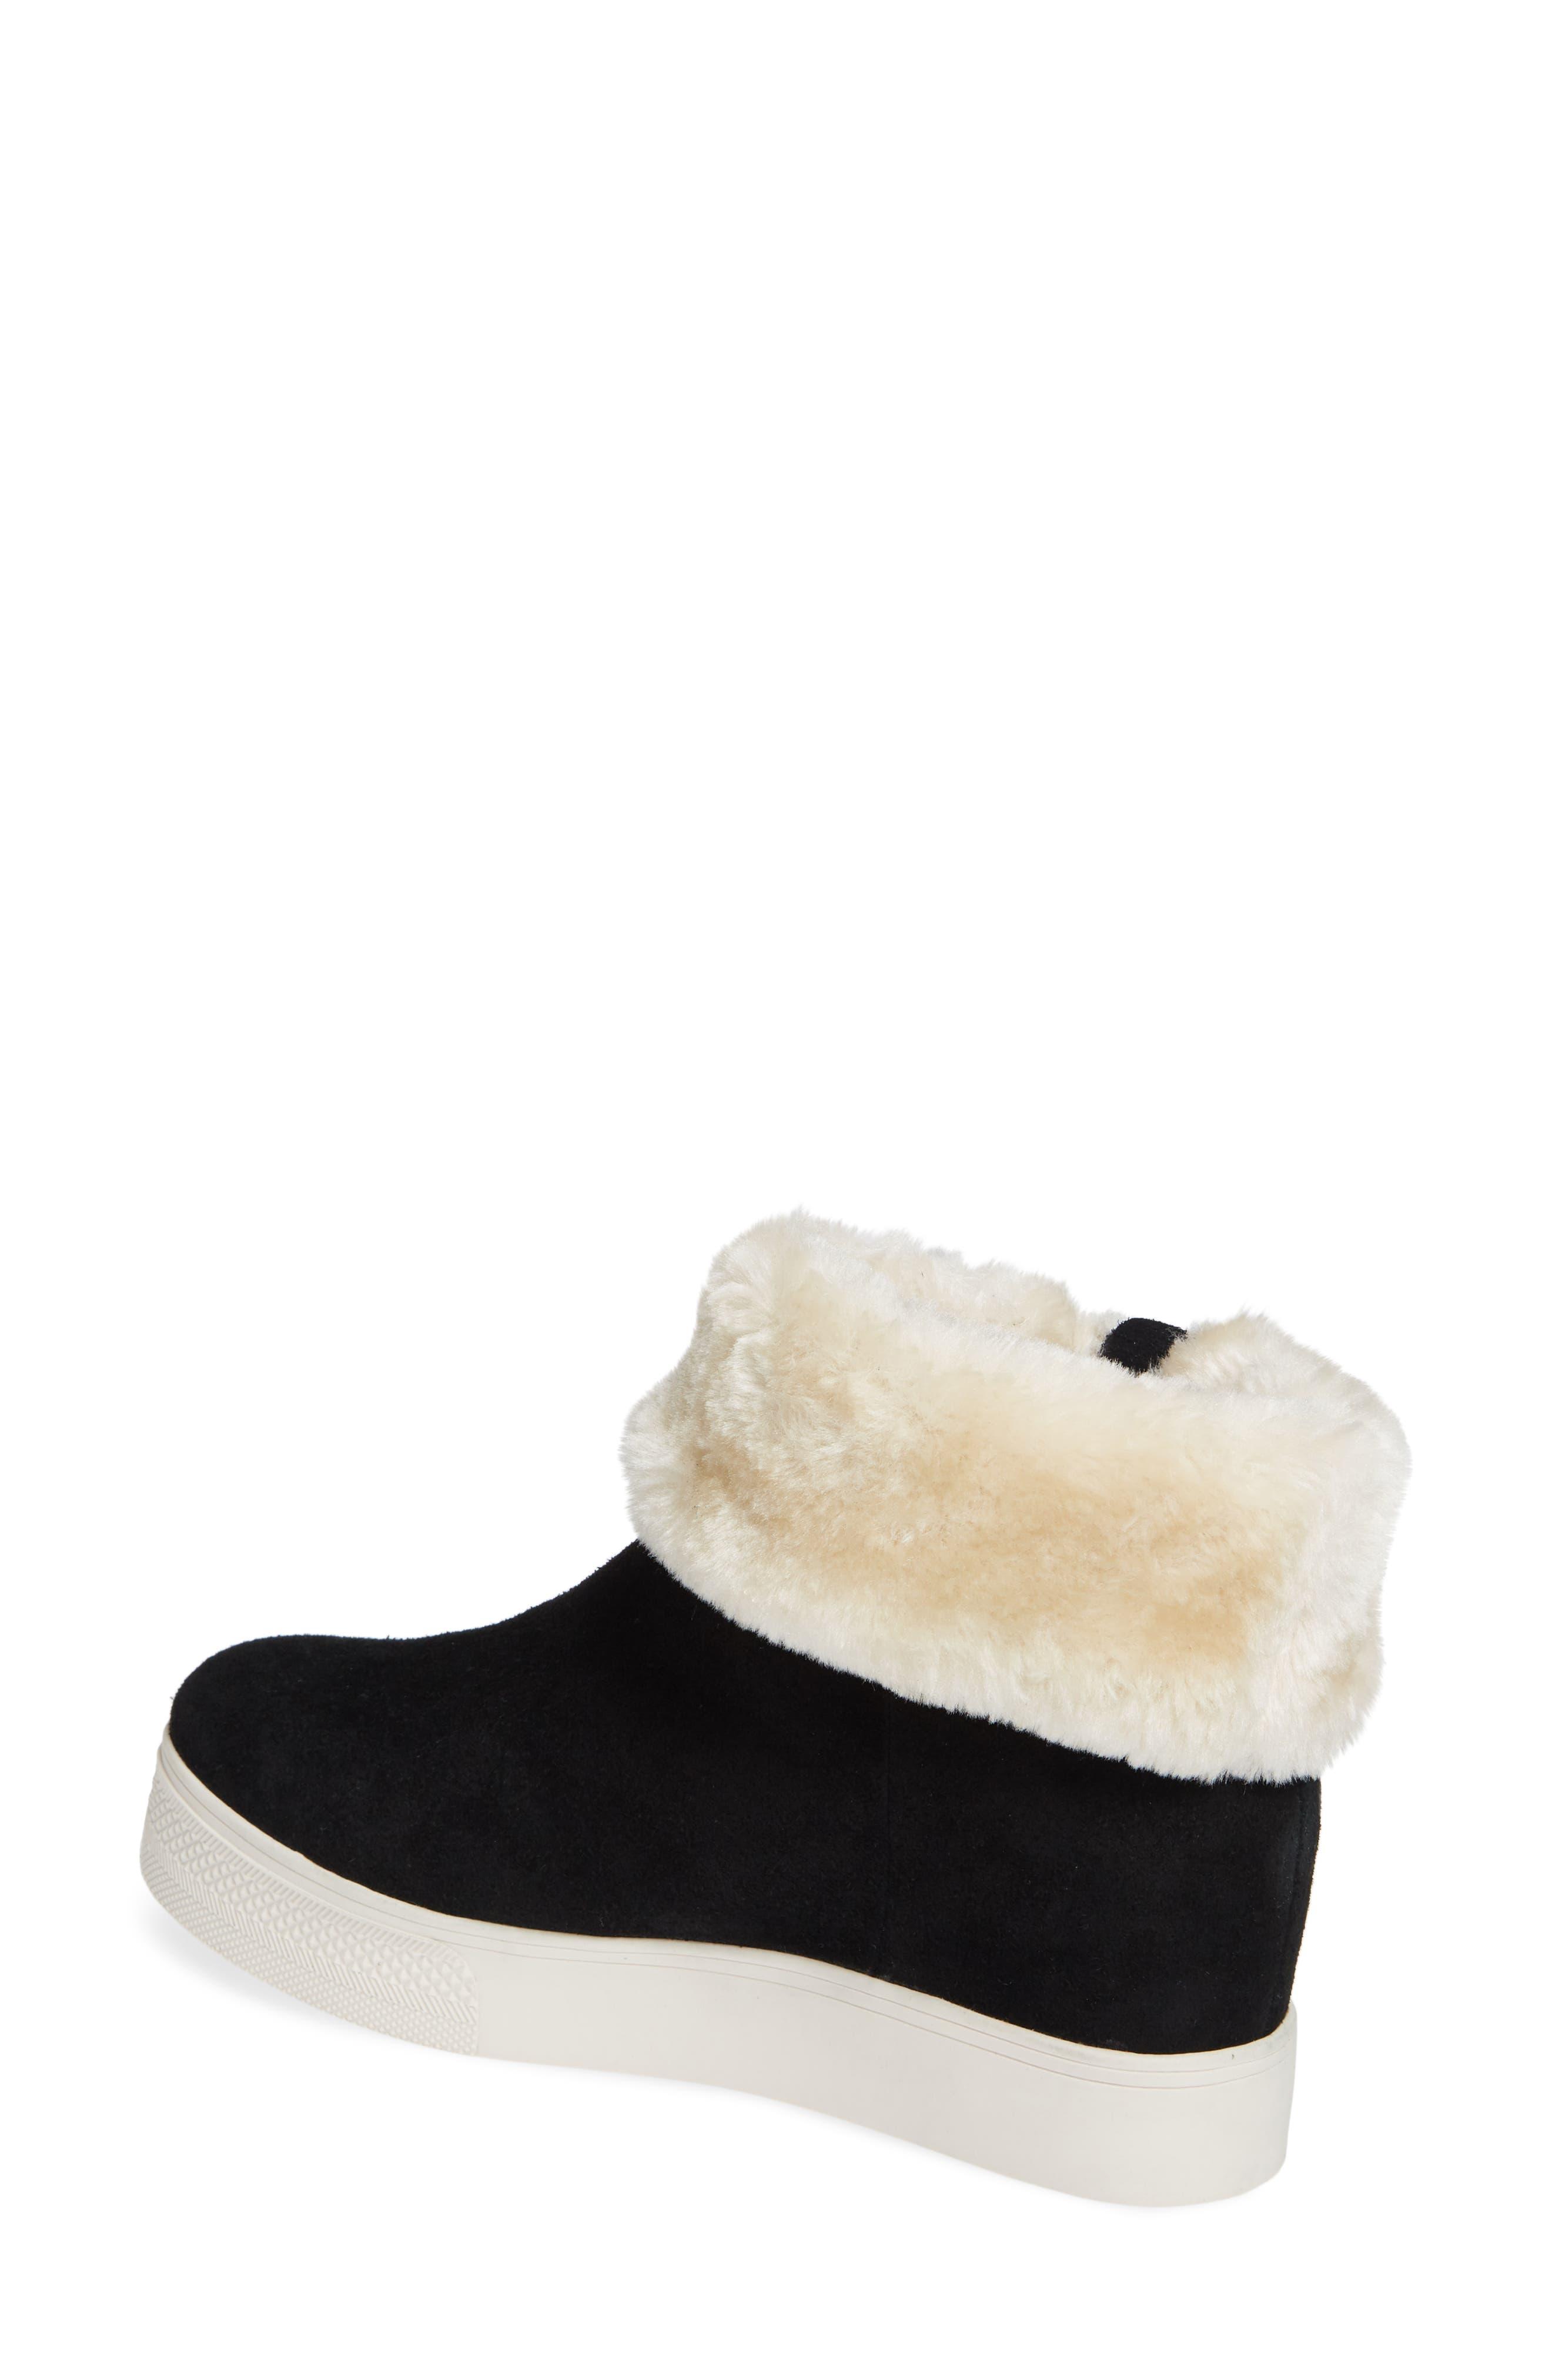 STEVE MADDEN,                             Faux Fur Lined Sneaker,                             Alternate thumbnail 2, color,                             006